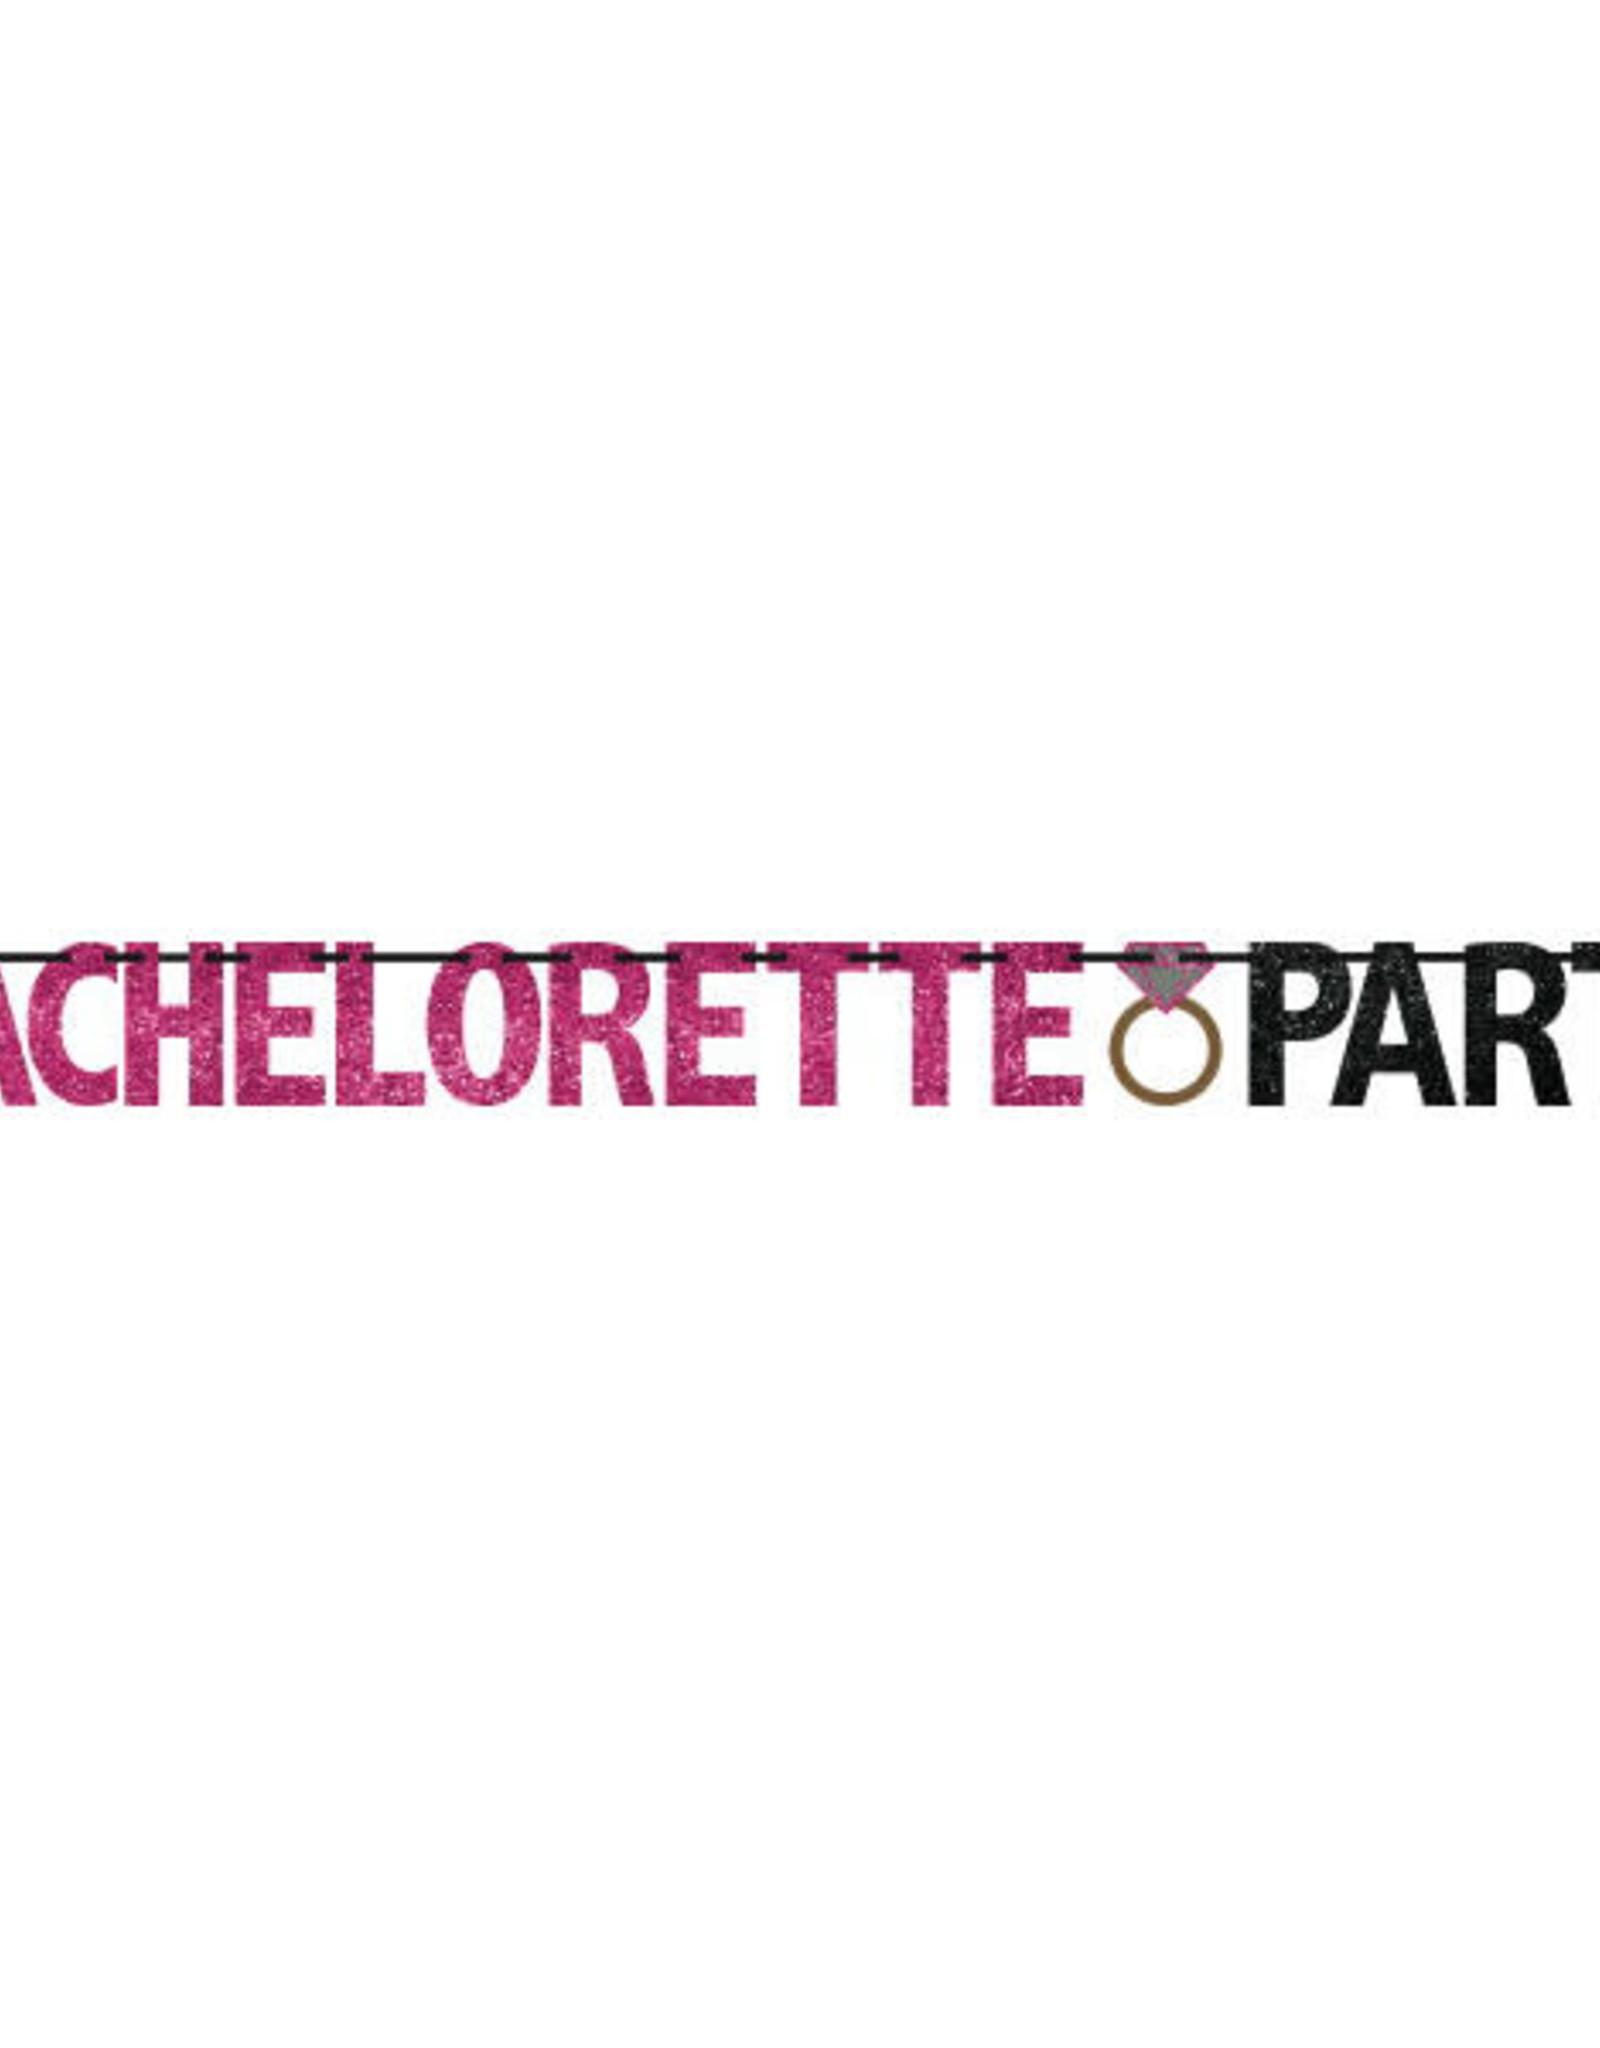 Bachelorette Party Banner 12FT